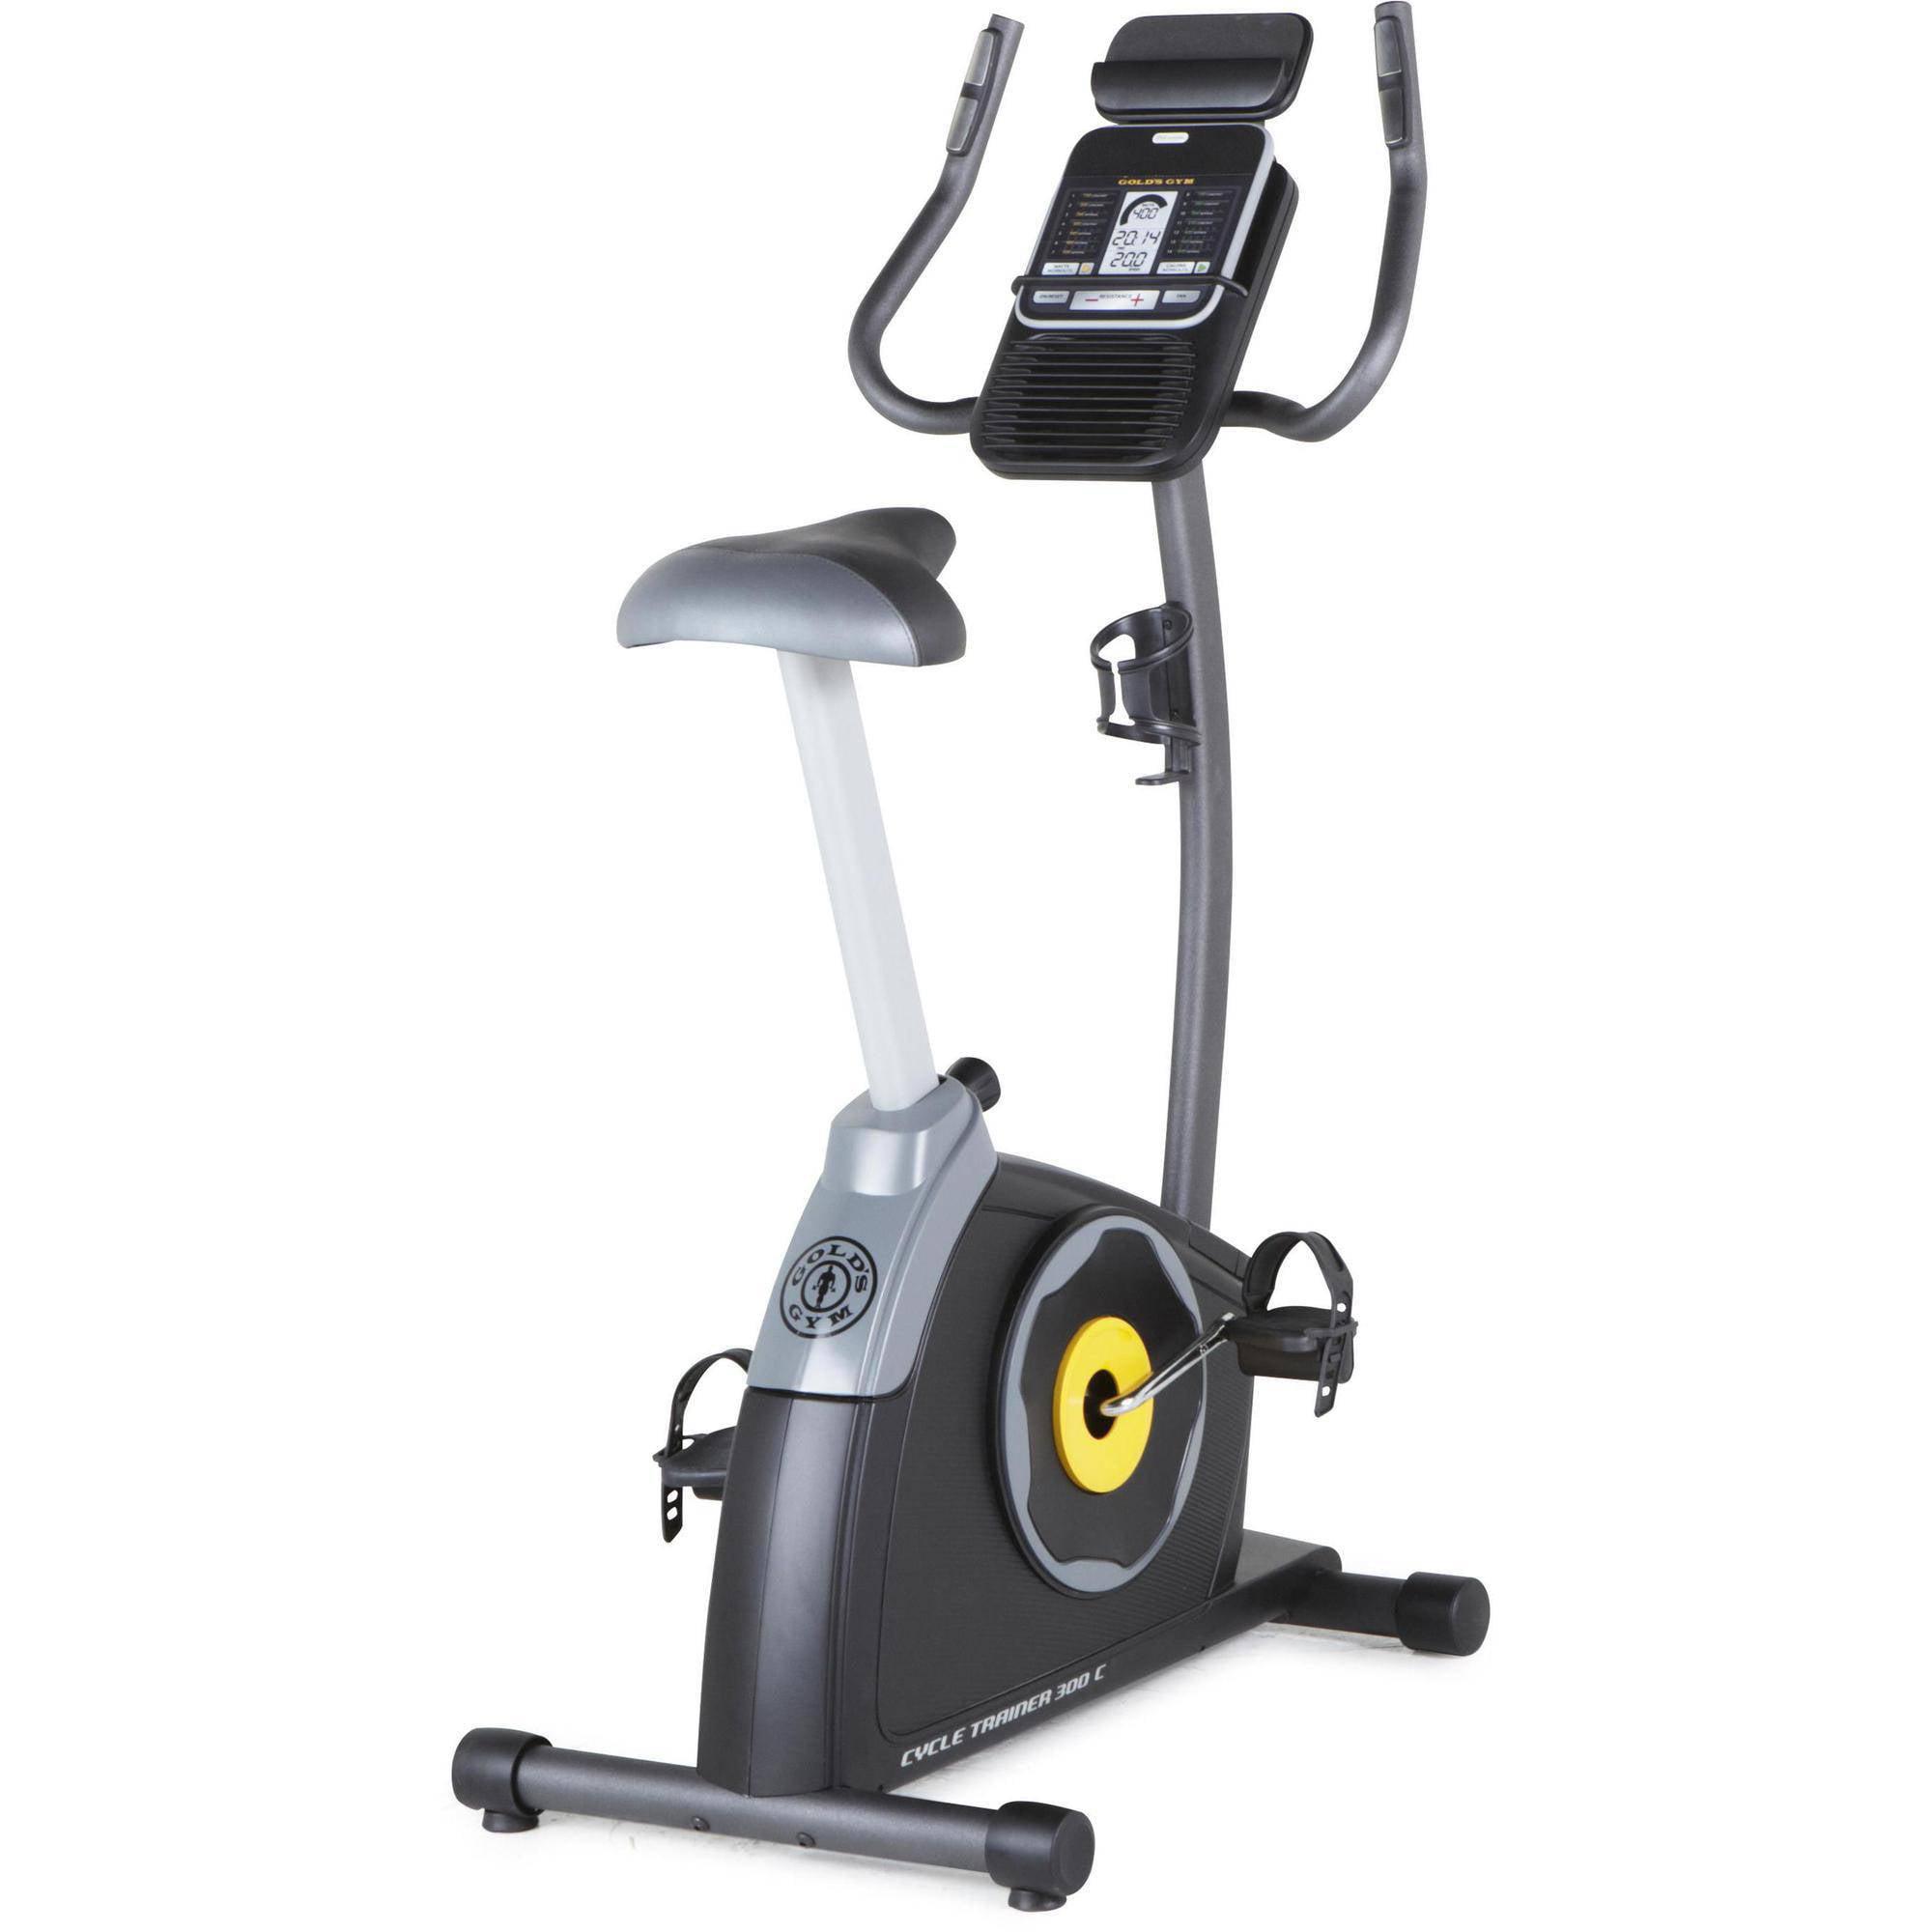 Ifit Workout Card Technology